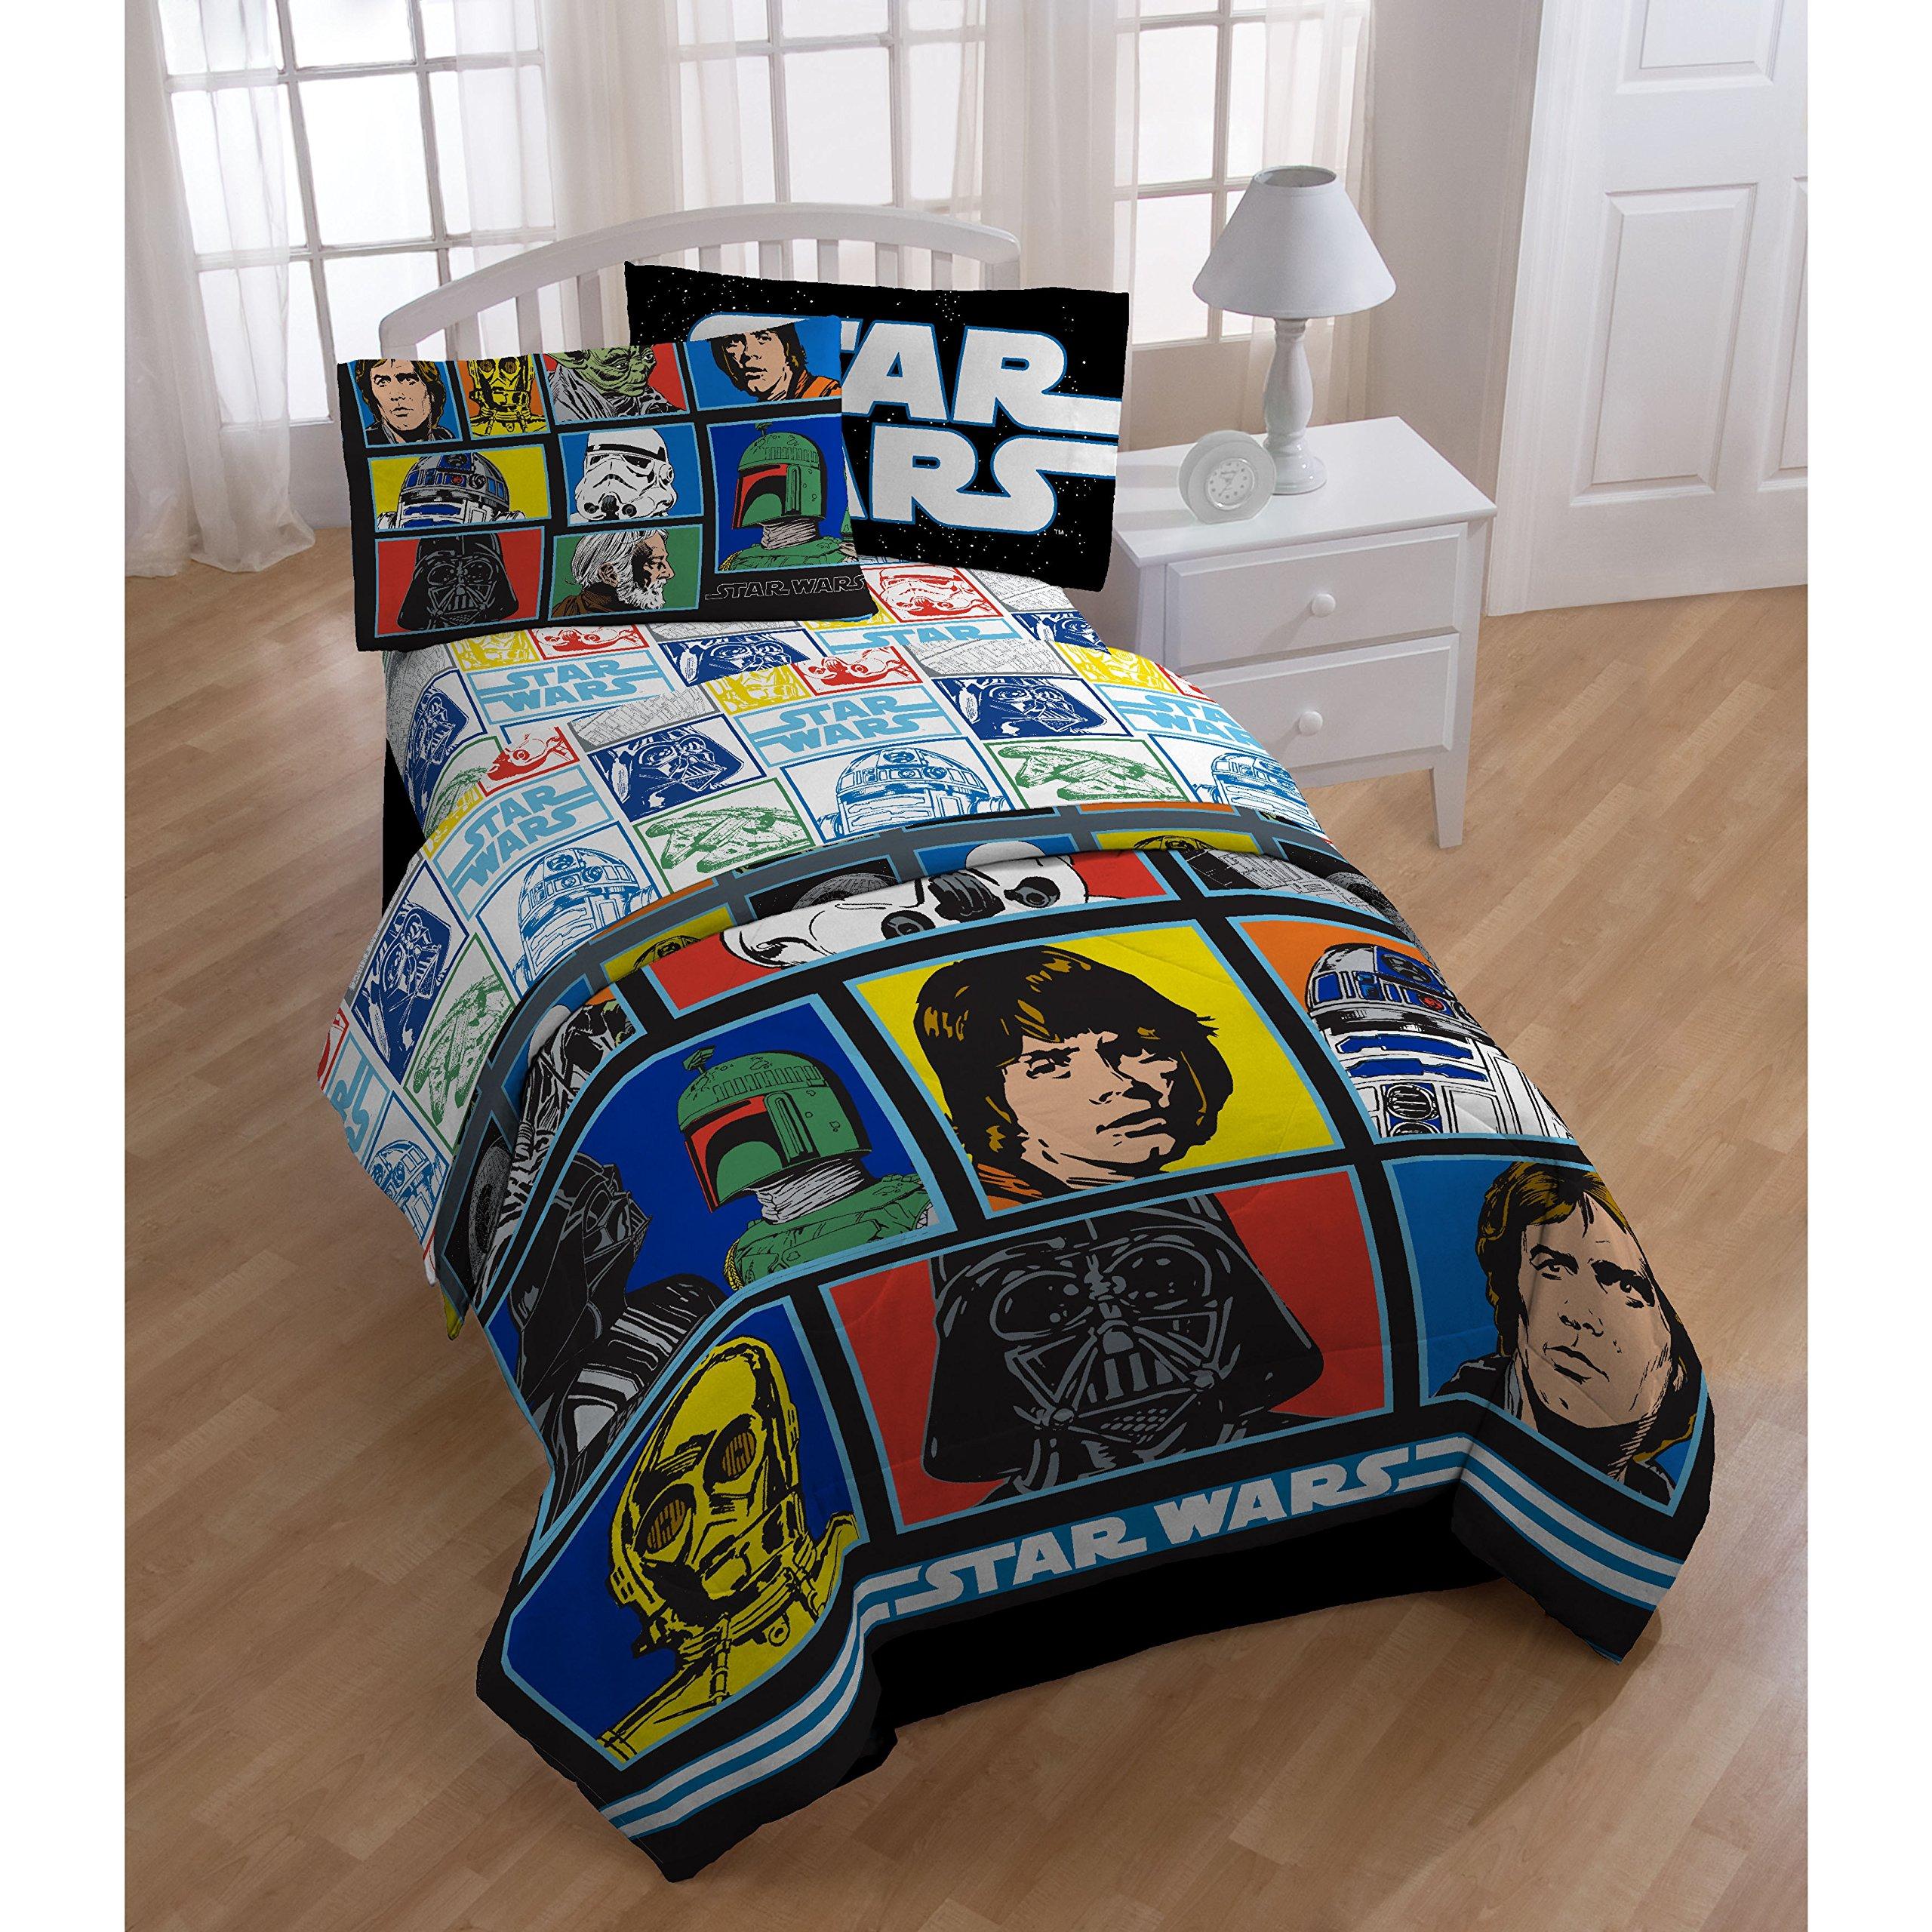 5 Piece Kids Blue Star Wars Theme Comforter Twin Set, Starwars Rogue 1 Imperial Trooper Bedding, Light Saber Death Star Darth Vader Luke Skywalker Yoda Movie Series Character Plush, Polyester